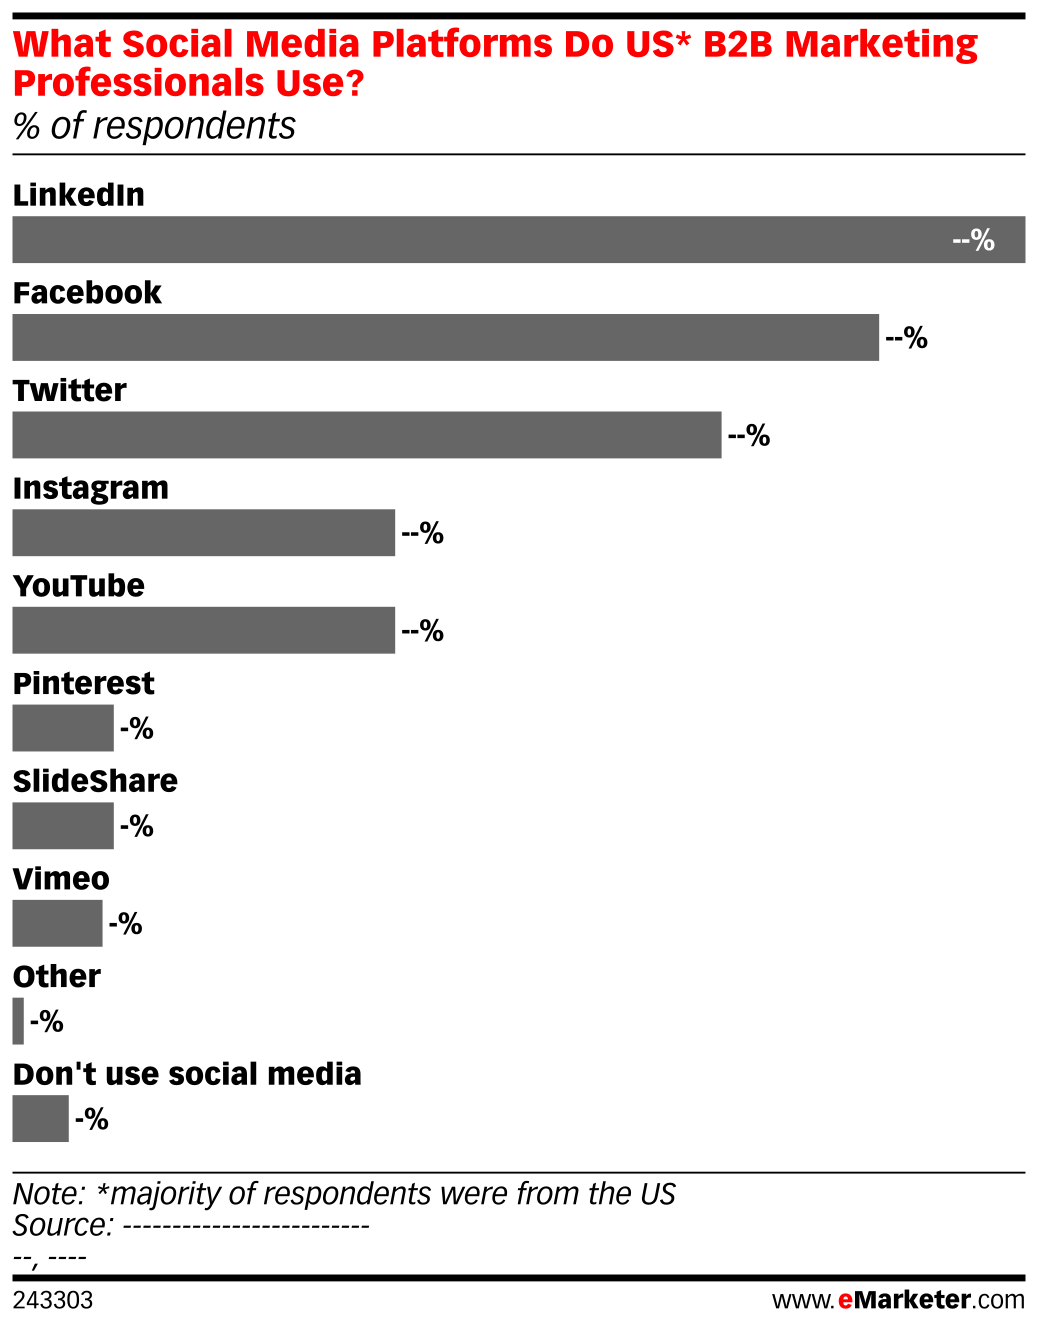 What Social Media Platforms Do US* B2B Marketing Professionals Use? (% of respondents)